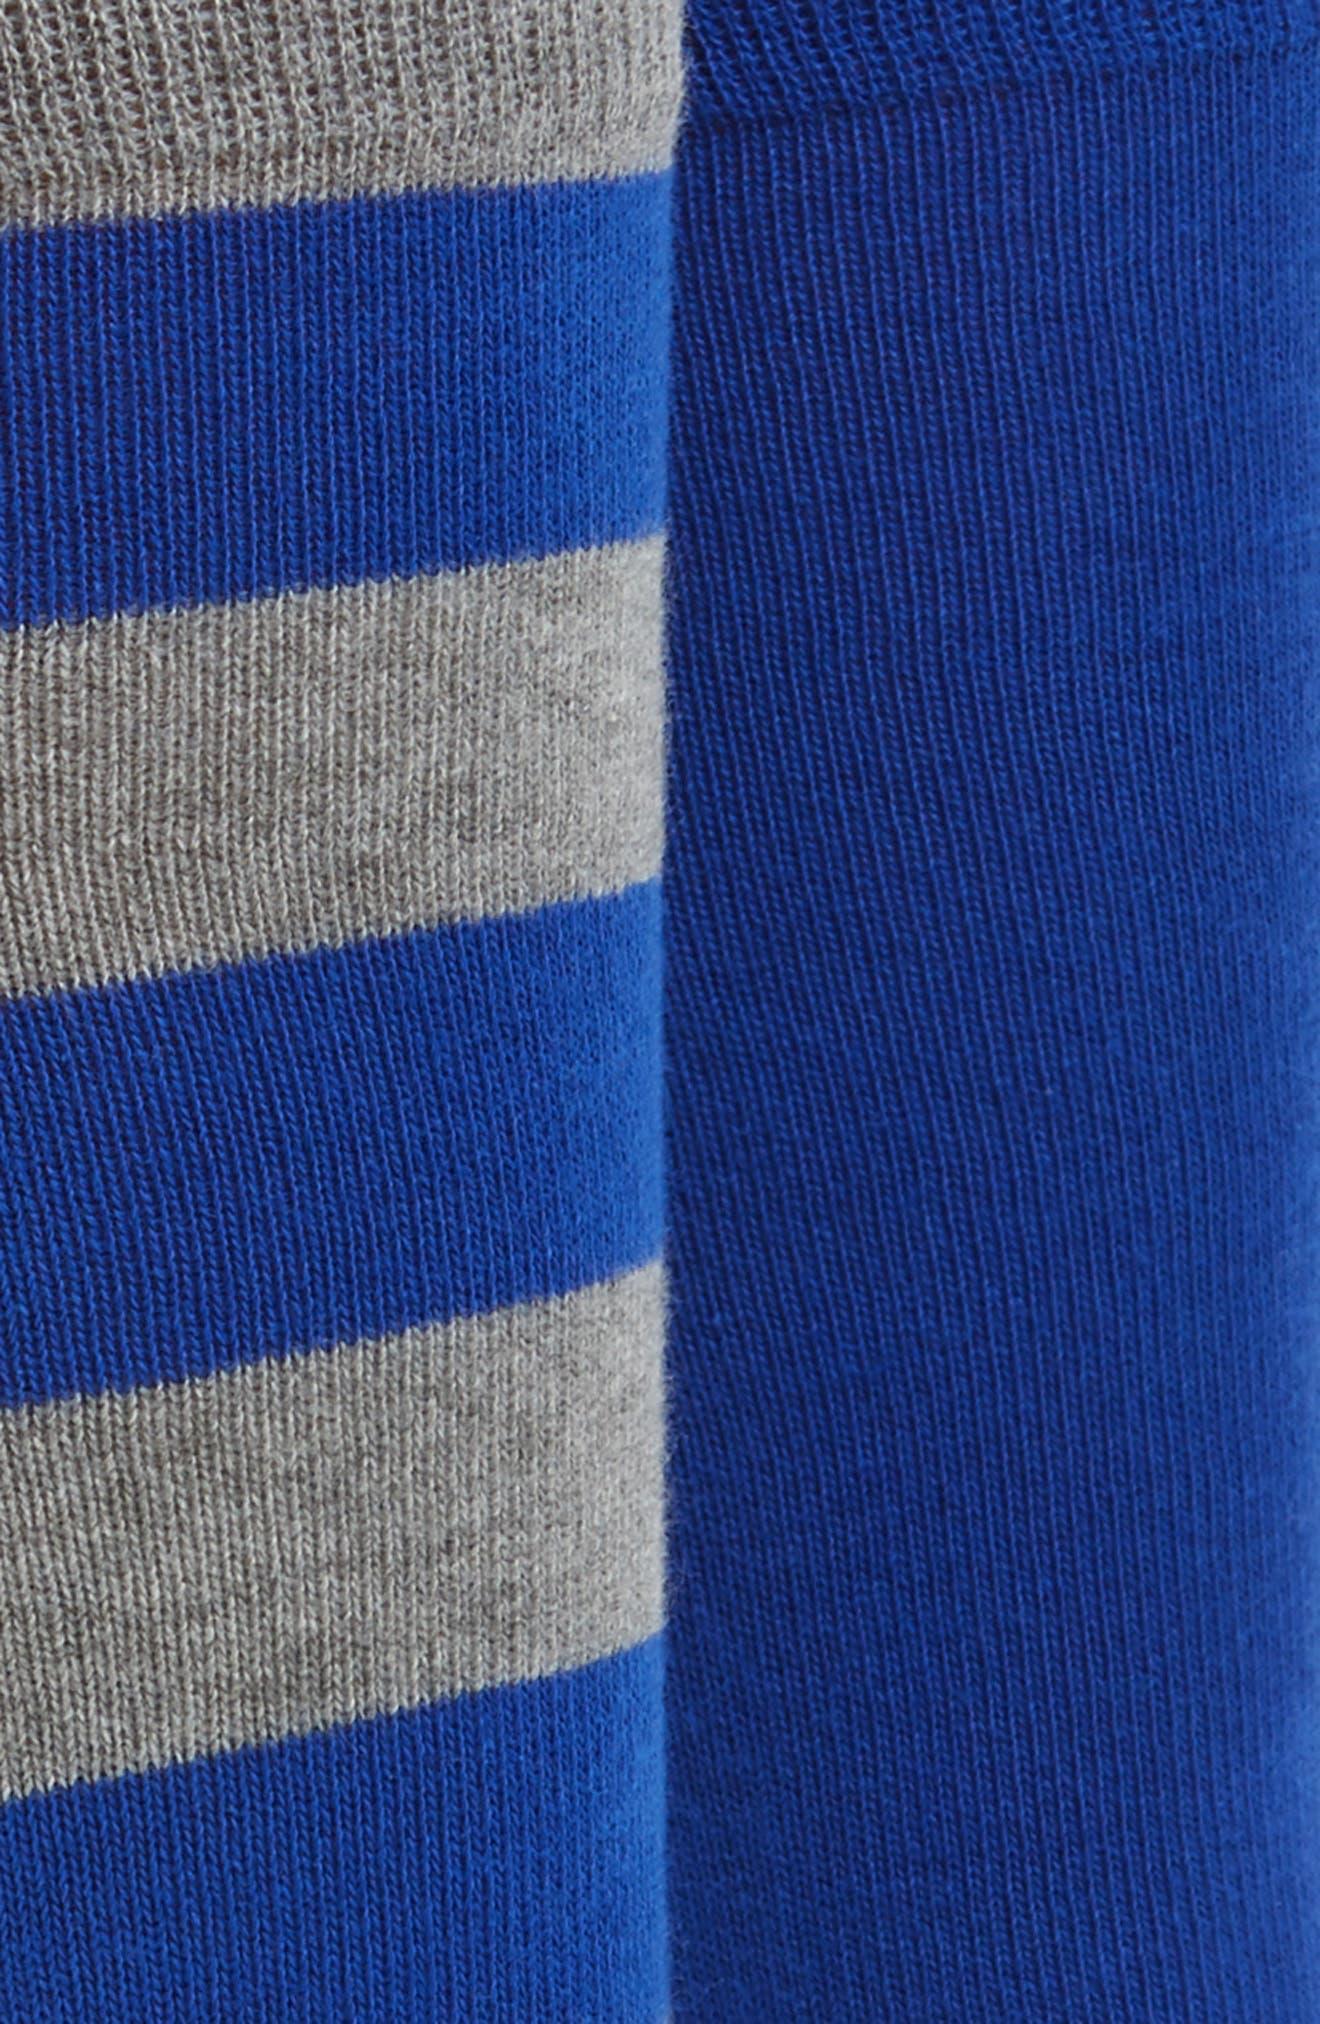 Cotton Blend Socks,                             Alternate thumbnail 38, color,